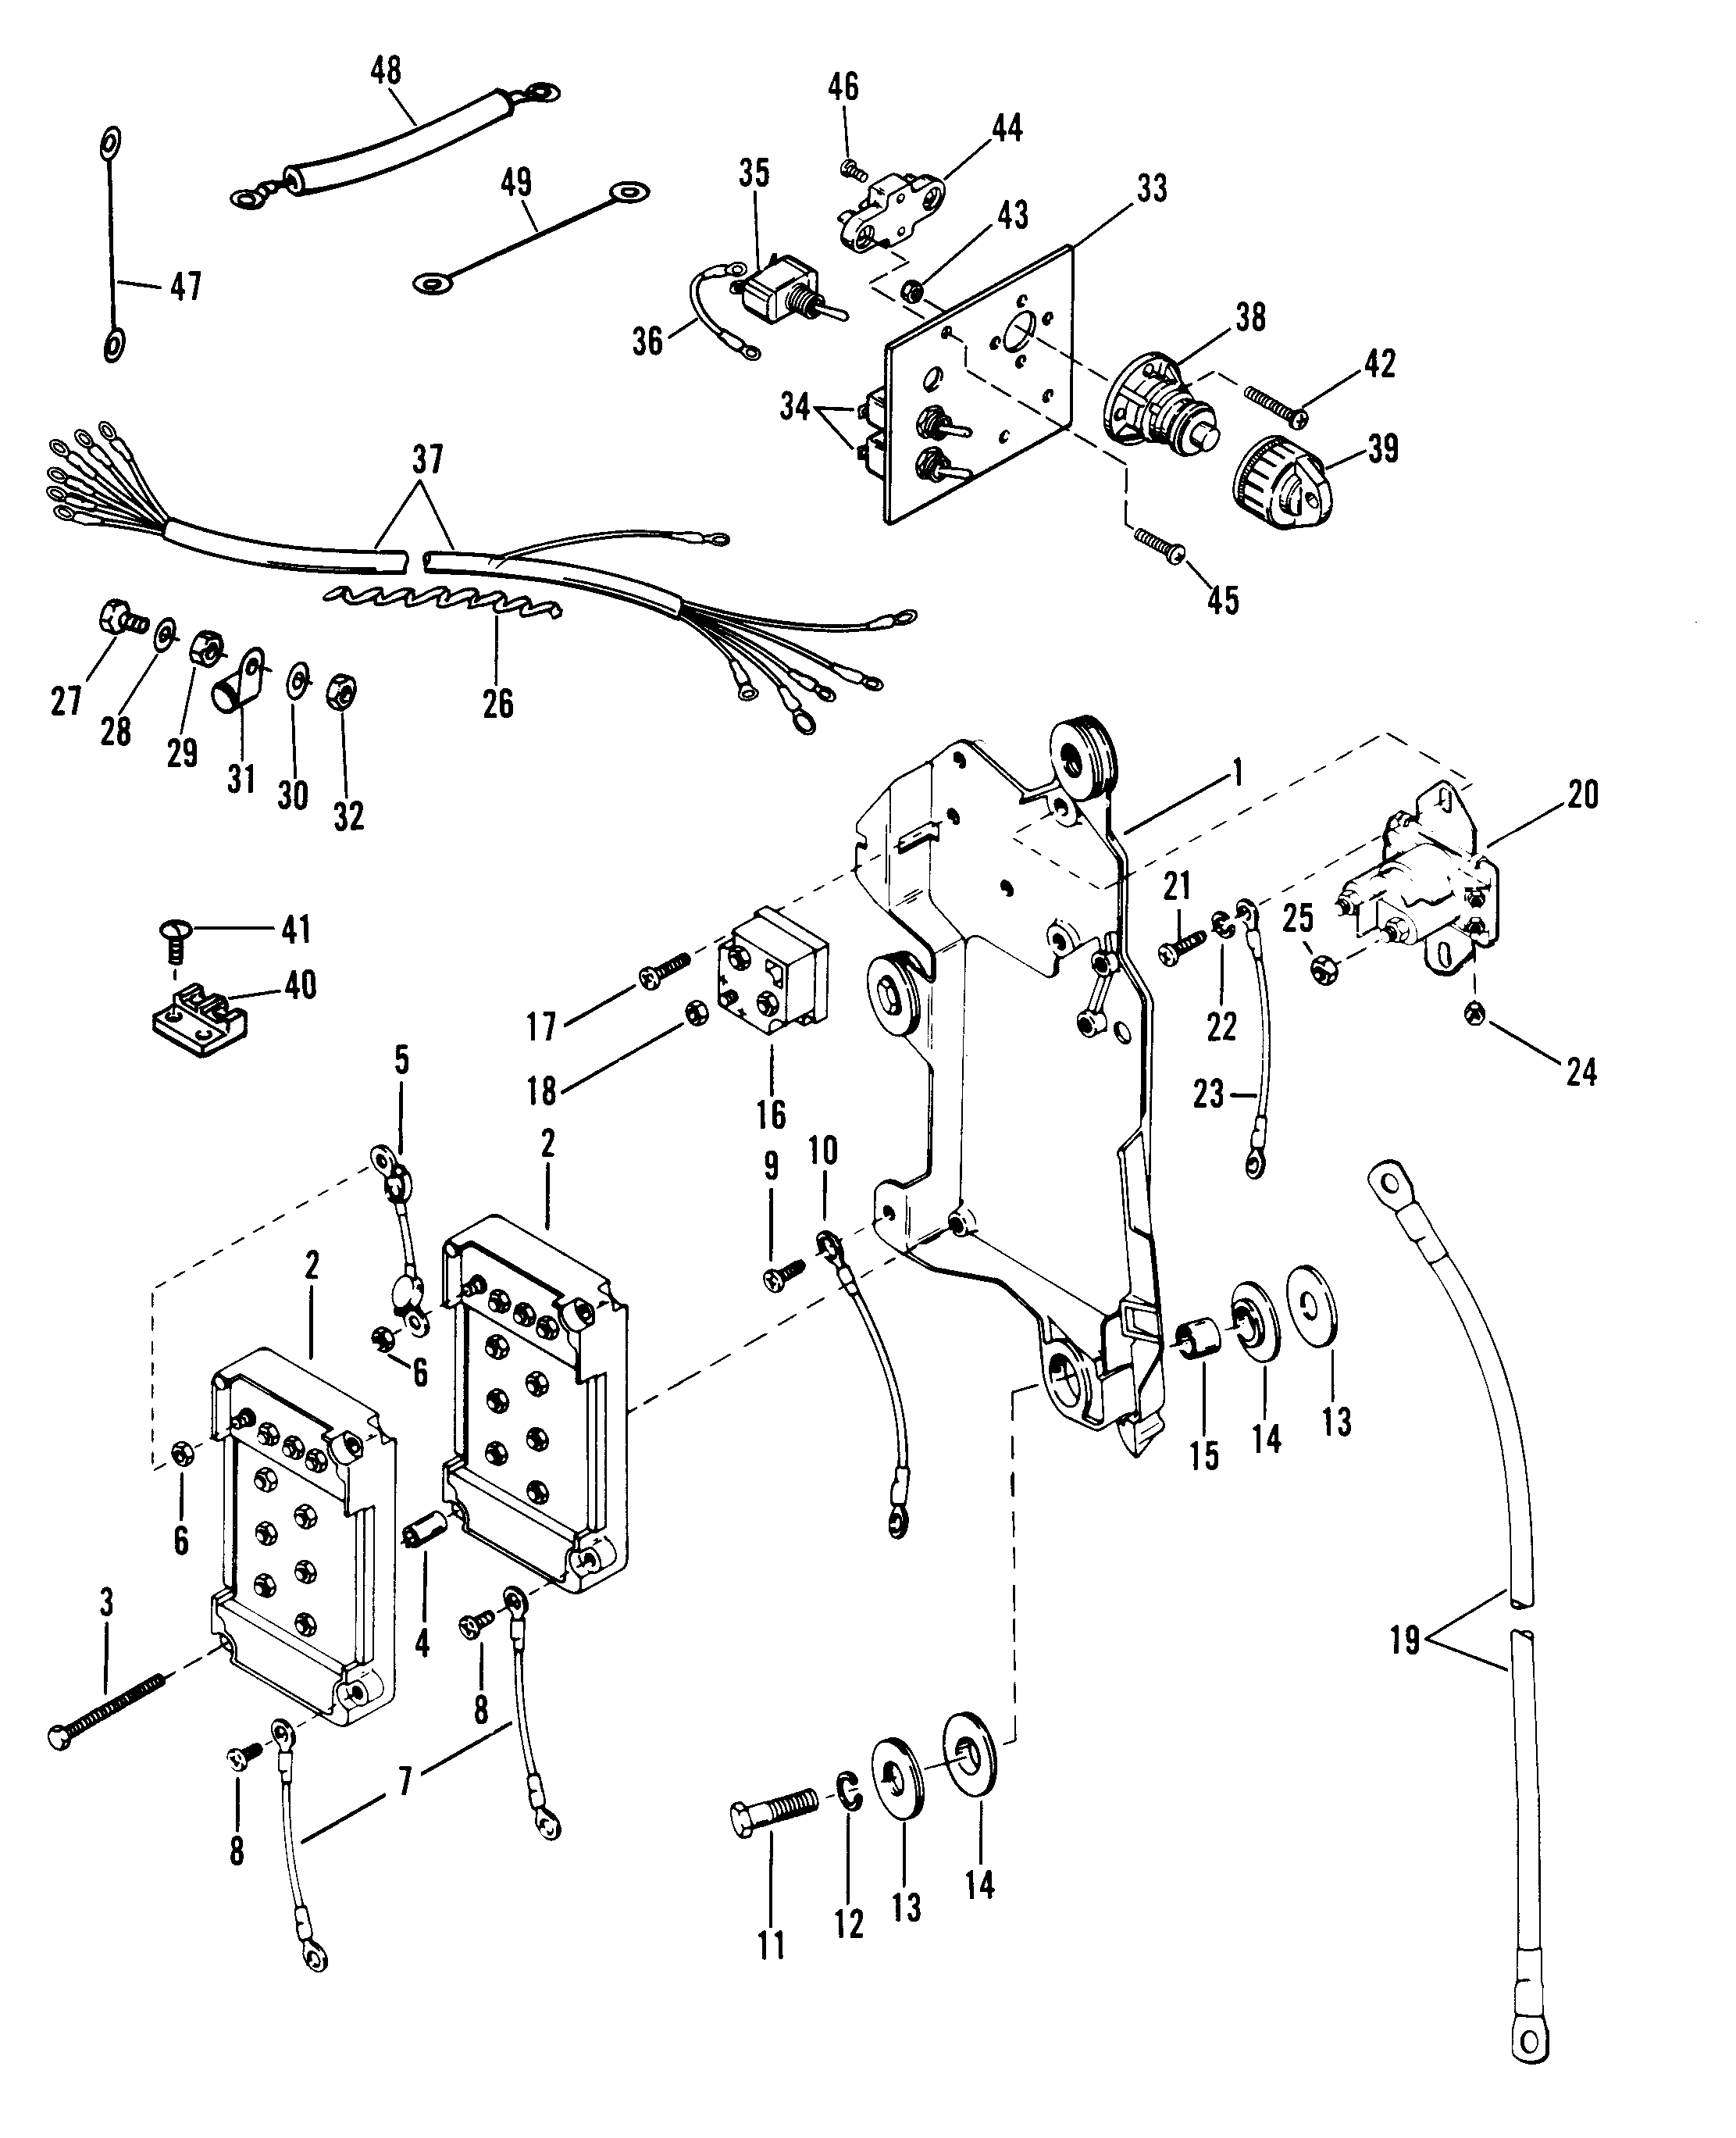 wiring harness  starter solenoid and rectifier for formula 1 carburetor